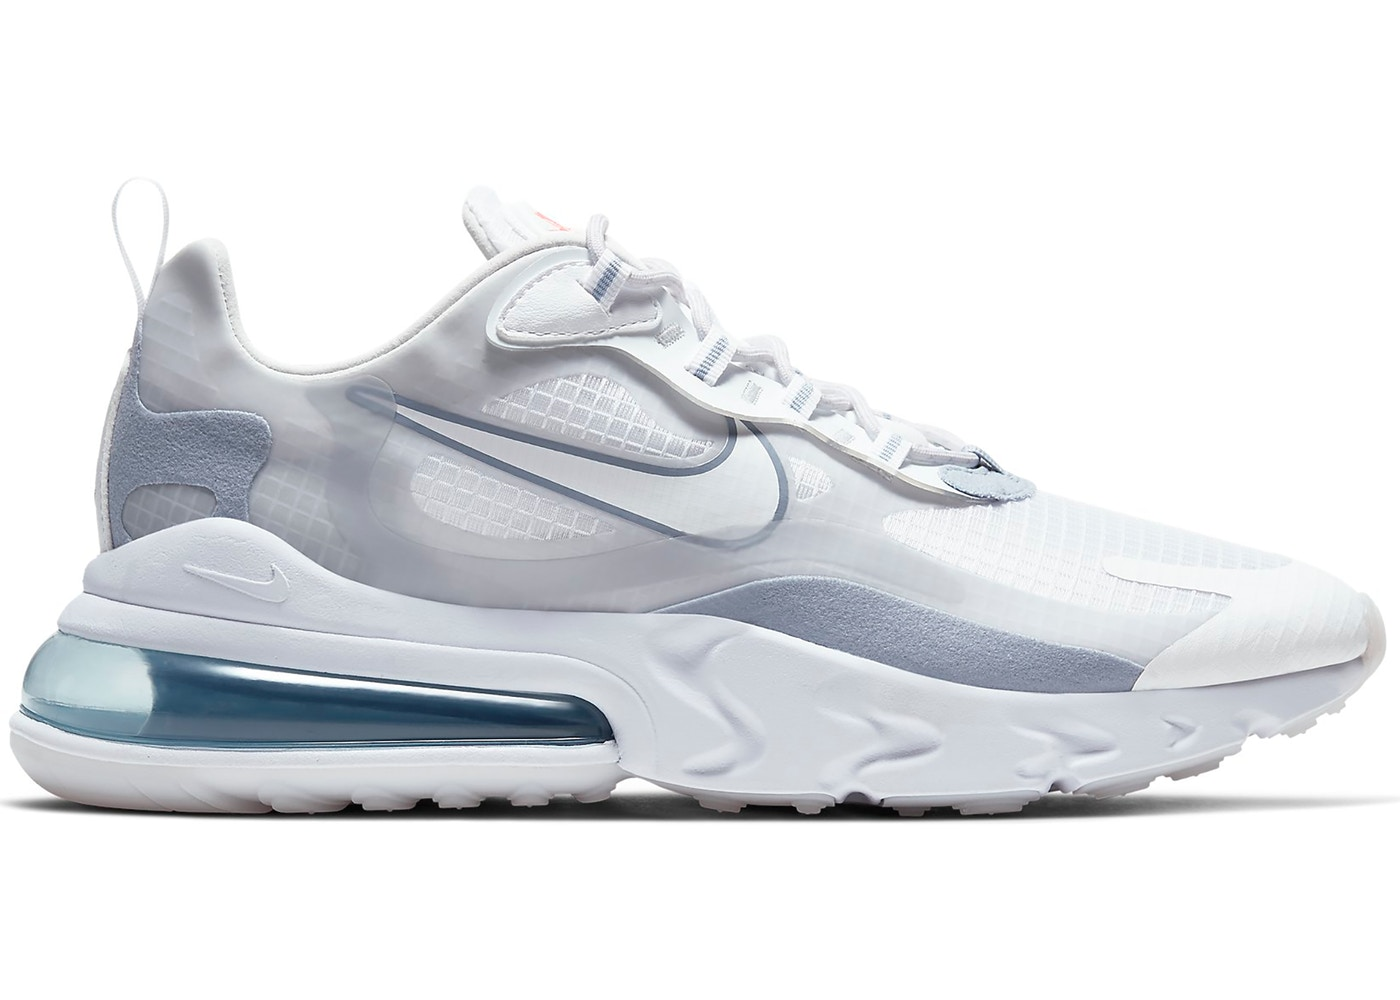 Nike Air Max 270 React White Pure Platinum